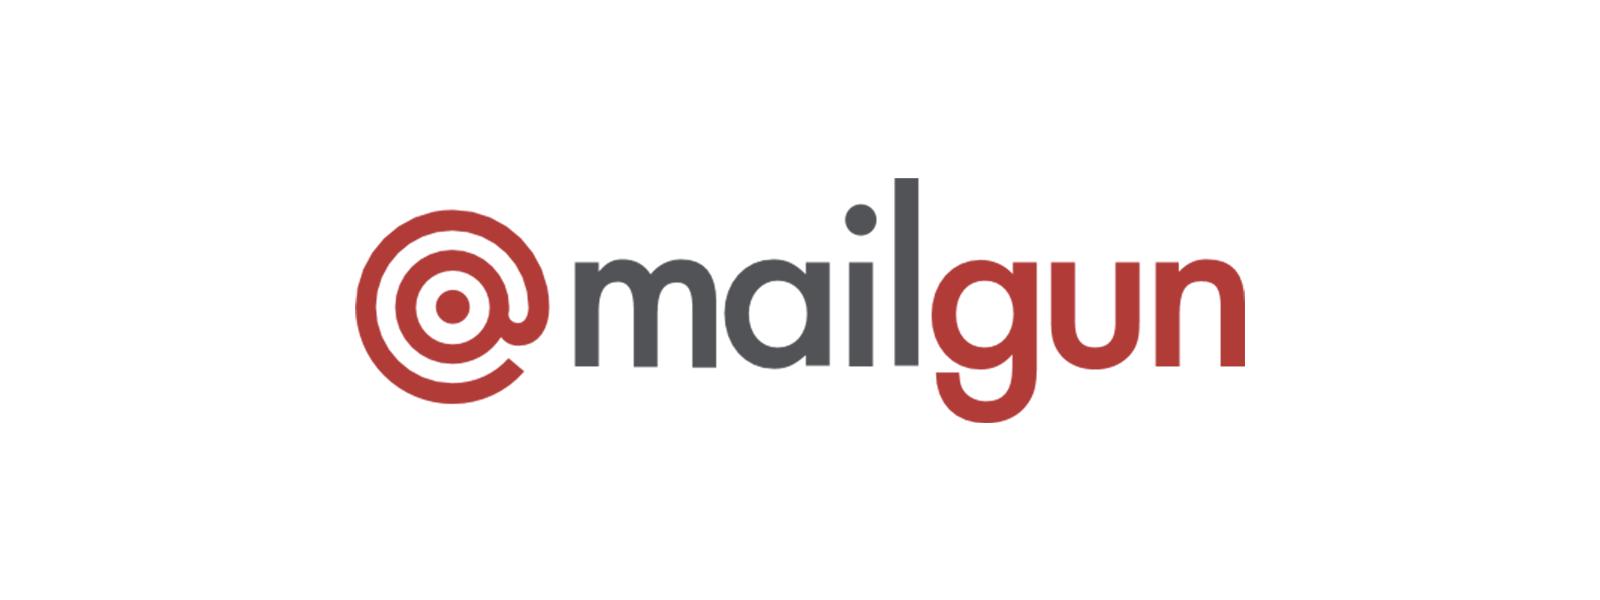 How to setup Mailgun for WordPress